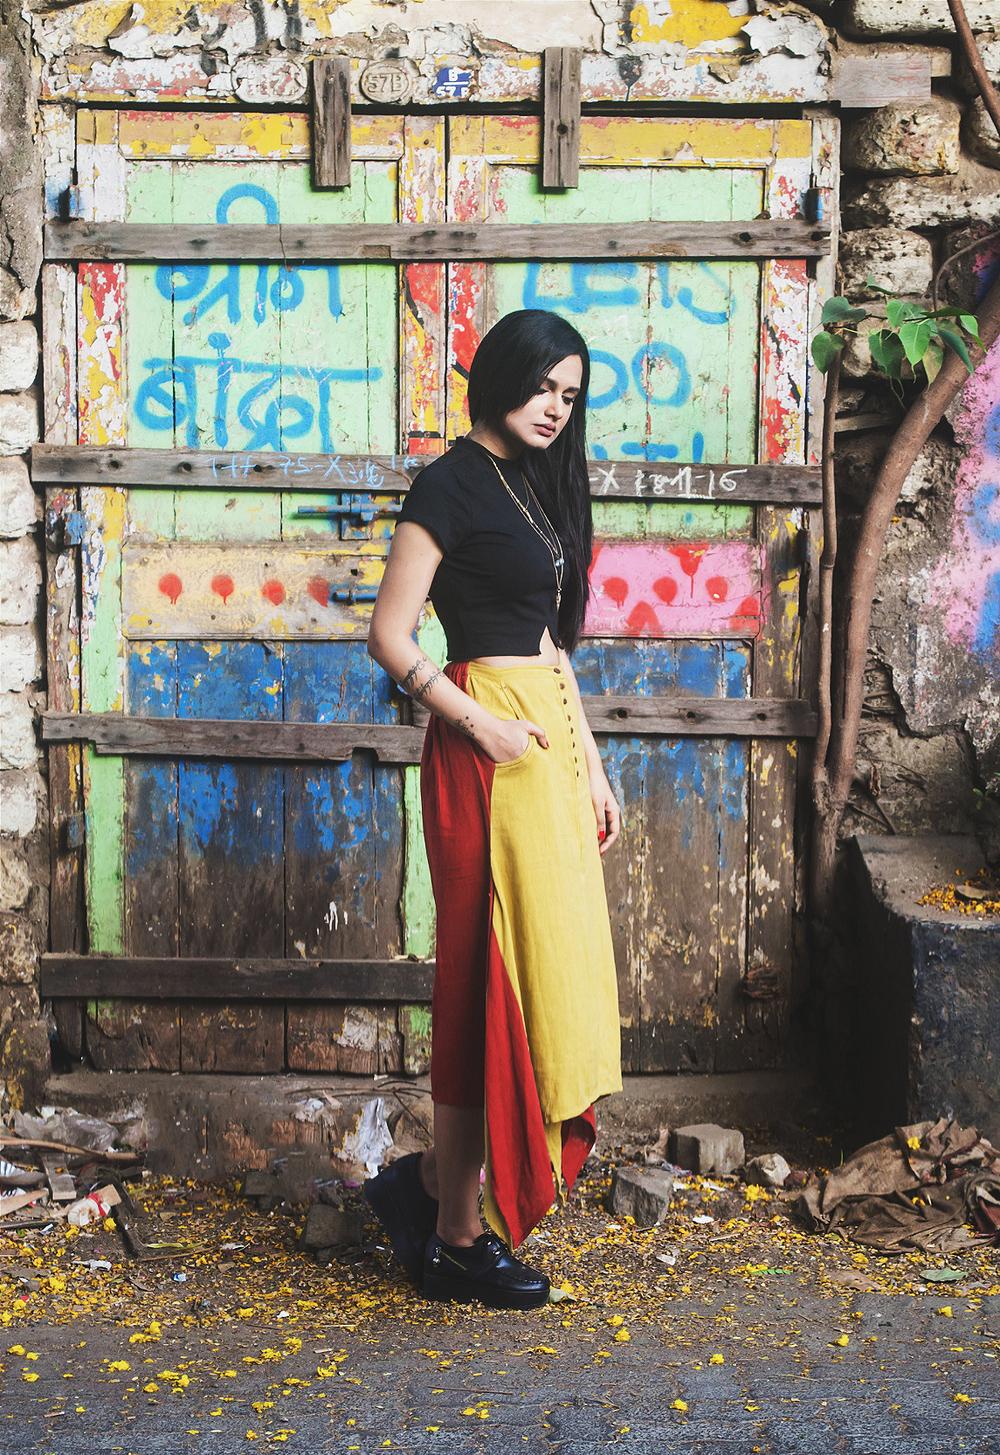 The-Chic-Armoire-by-Nidhi-Kunder-Jayati-Goenka-4